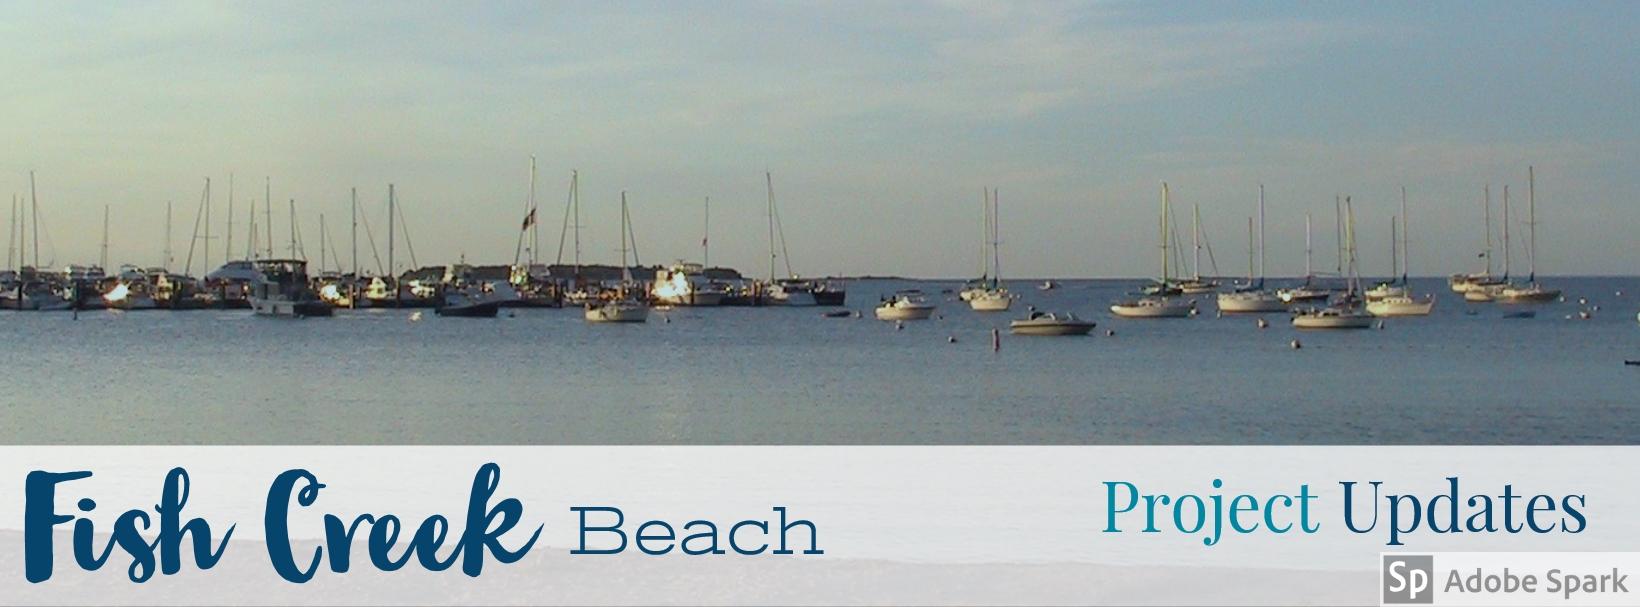 Fish Creek Beach Banner